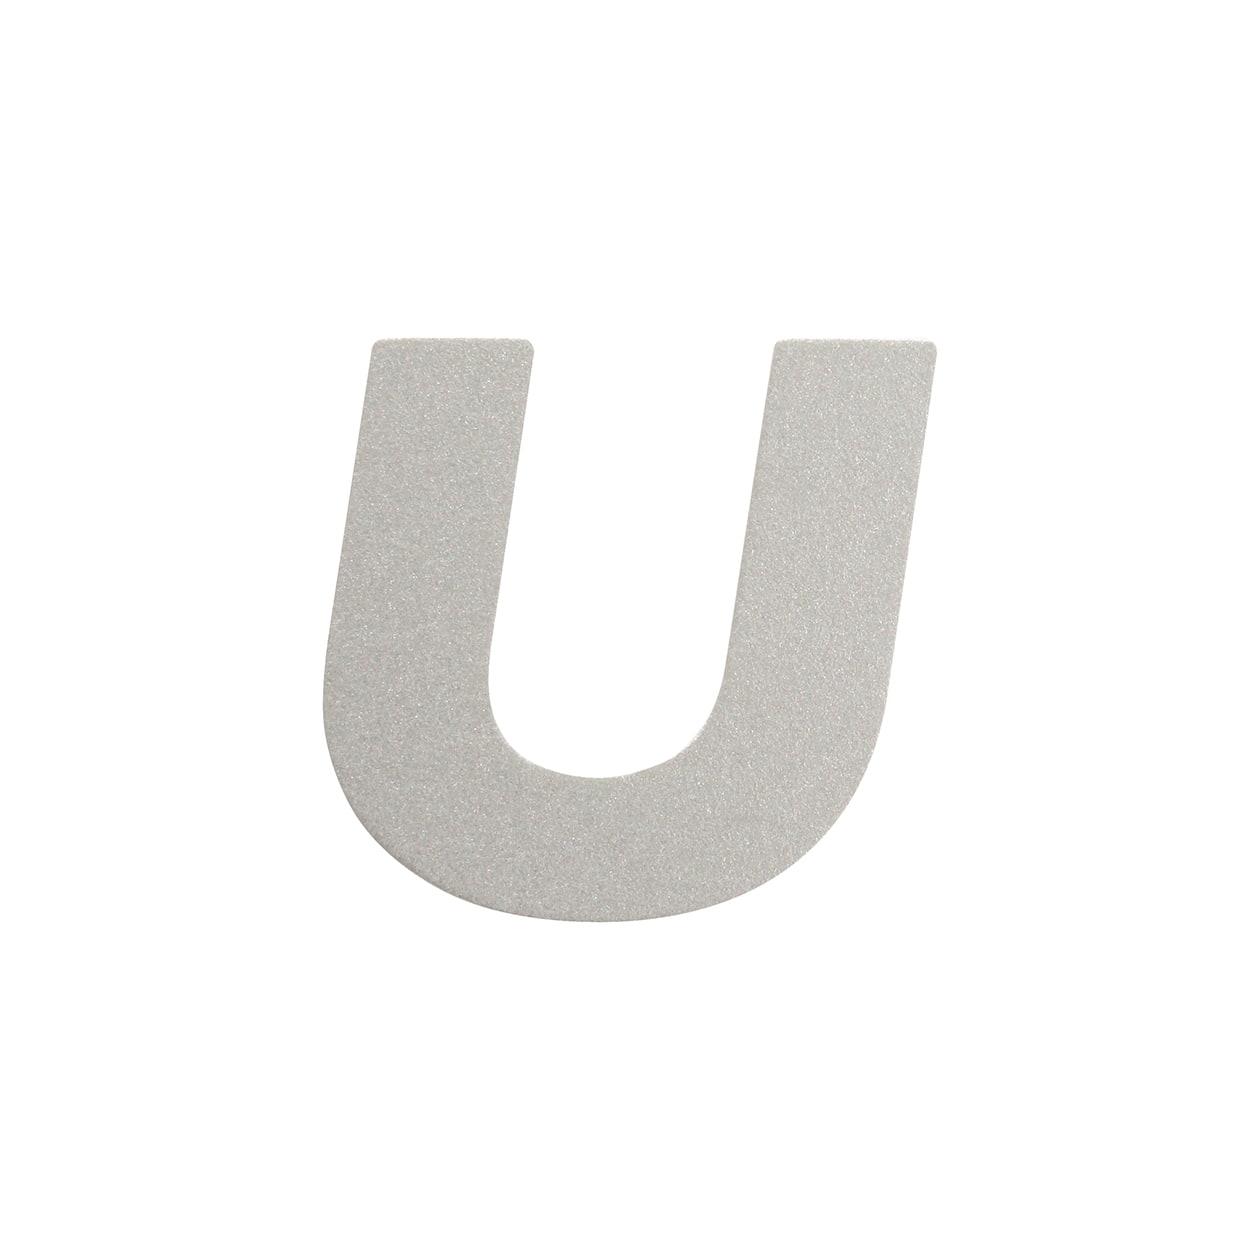 No.395ボード A7カードDC 文字U シルバー